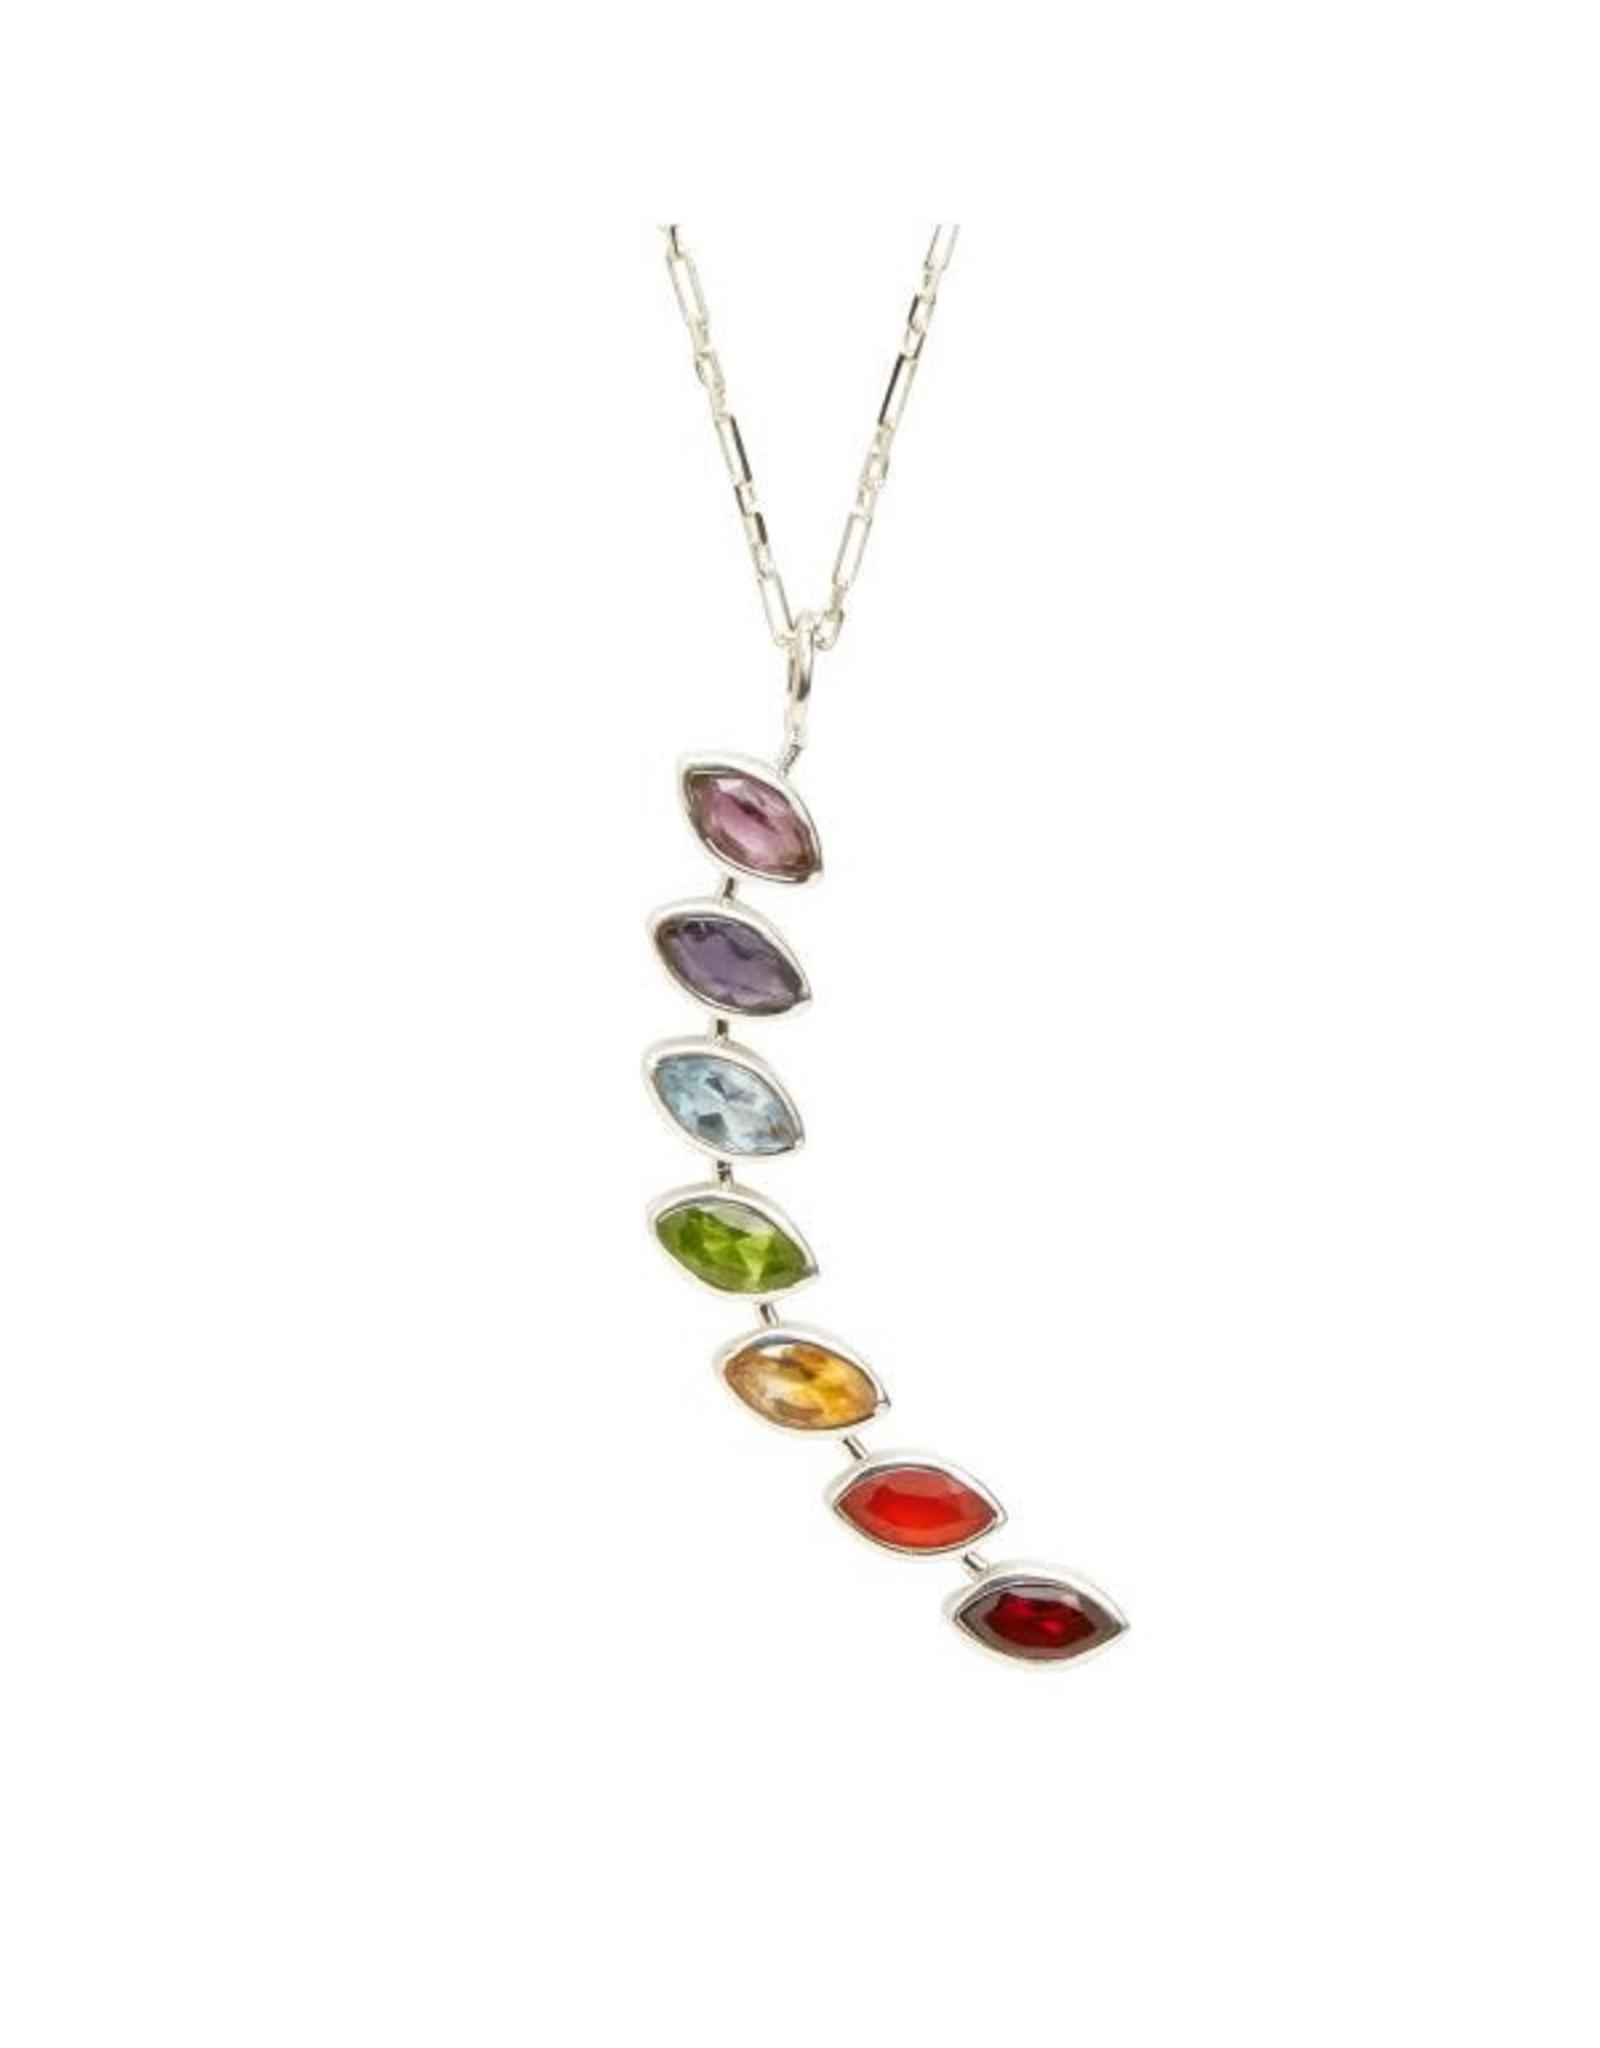 Chakra Stone Necklace, India